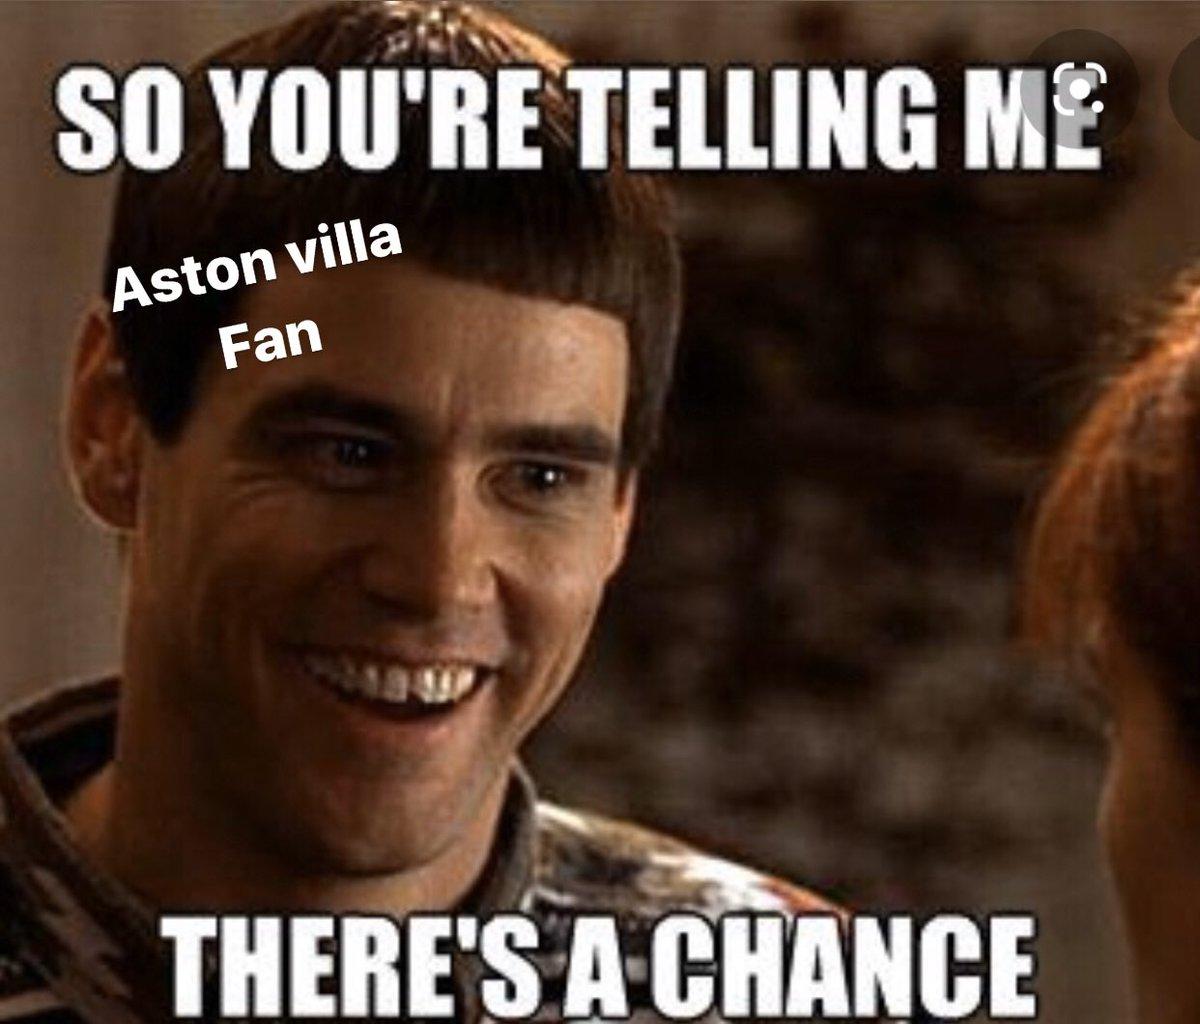 Aston Villa fans this weekend #astonvilla #mancity #avfc #mcfc #CarabaoCup #CarabaoCupFinal